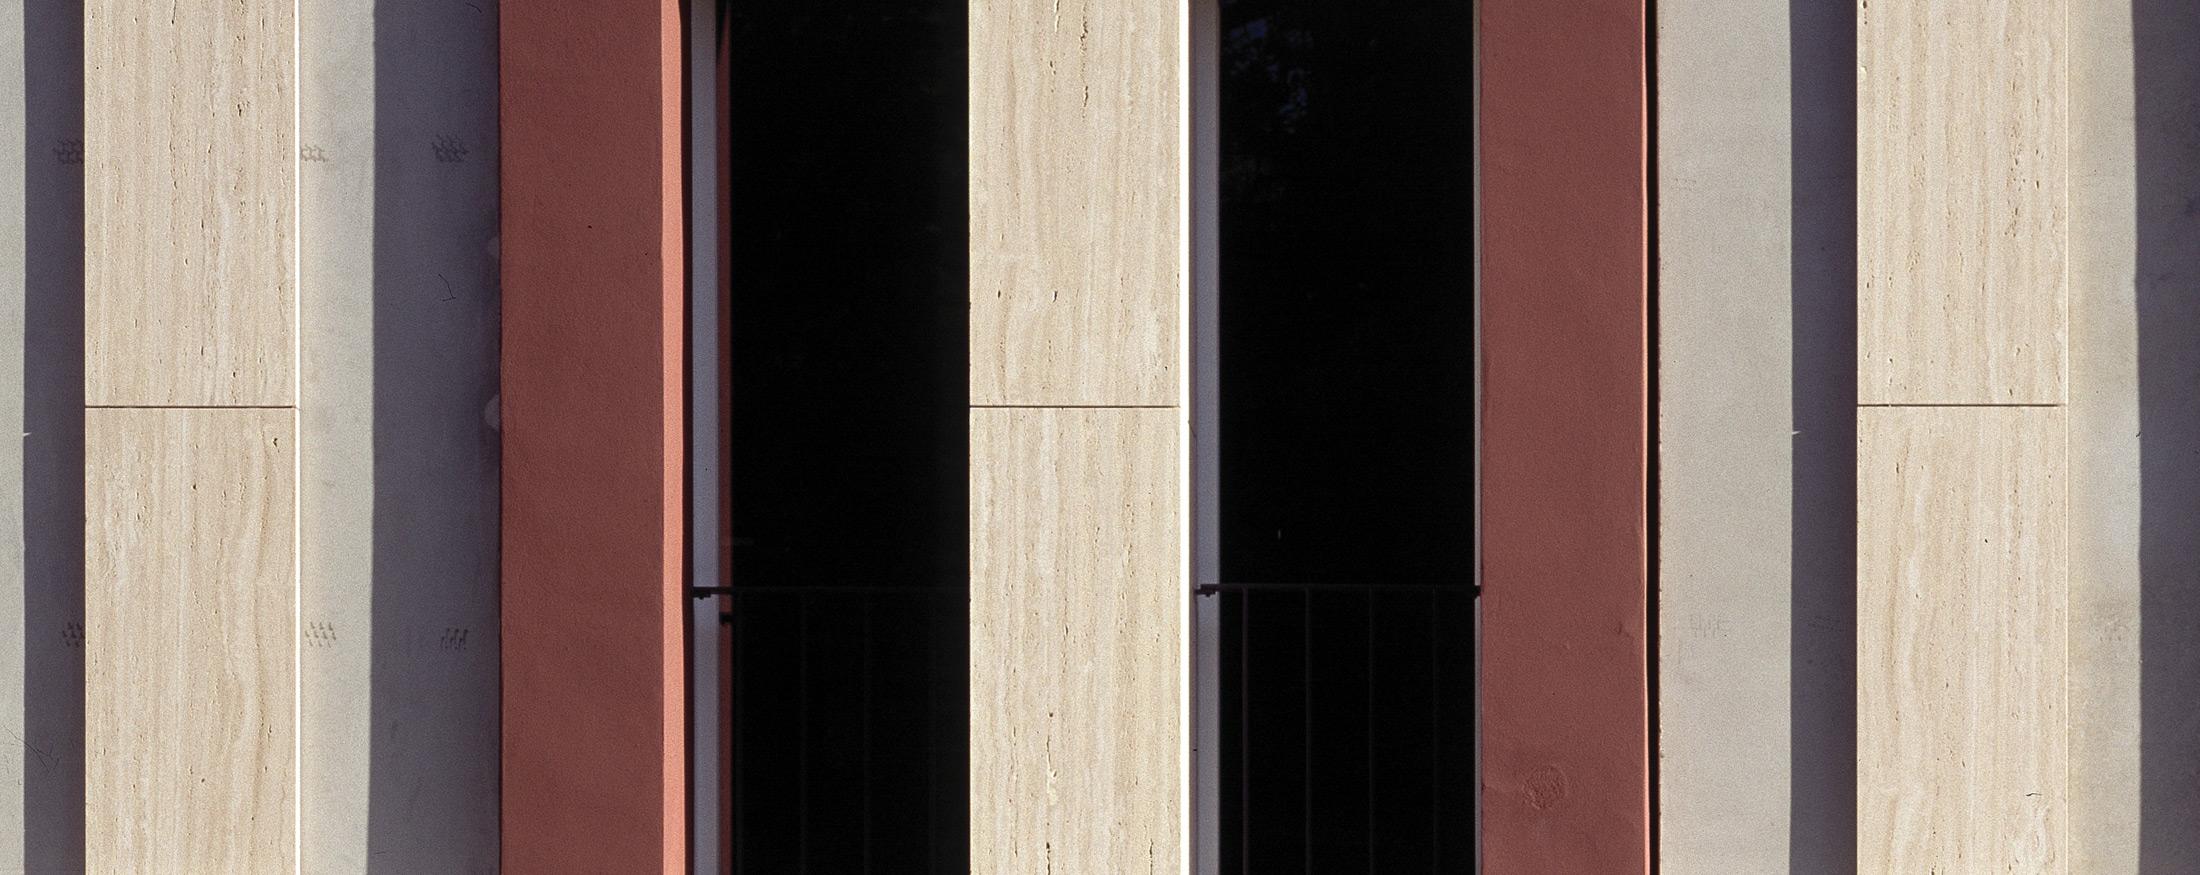 Cymed-Bochum-Sued-Detail-Fassade.jpg